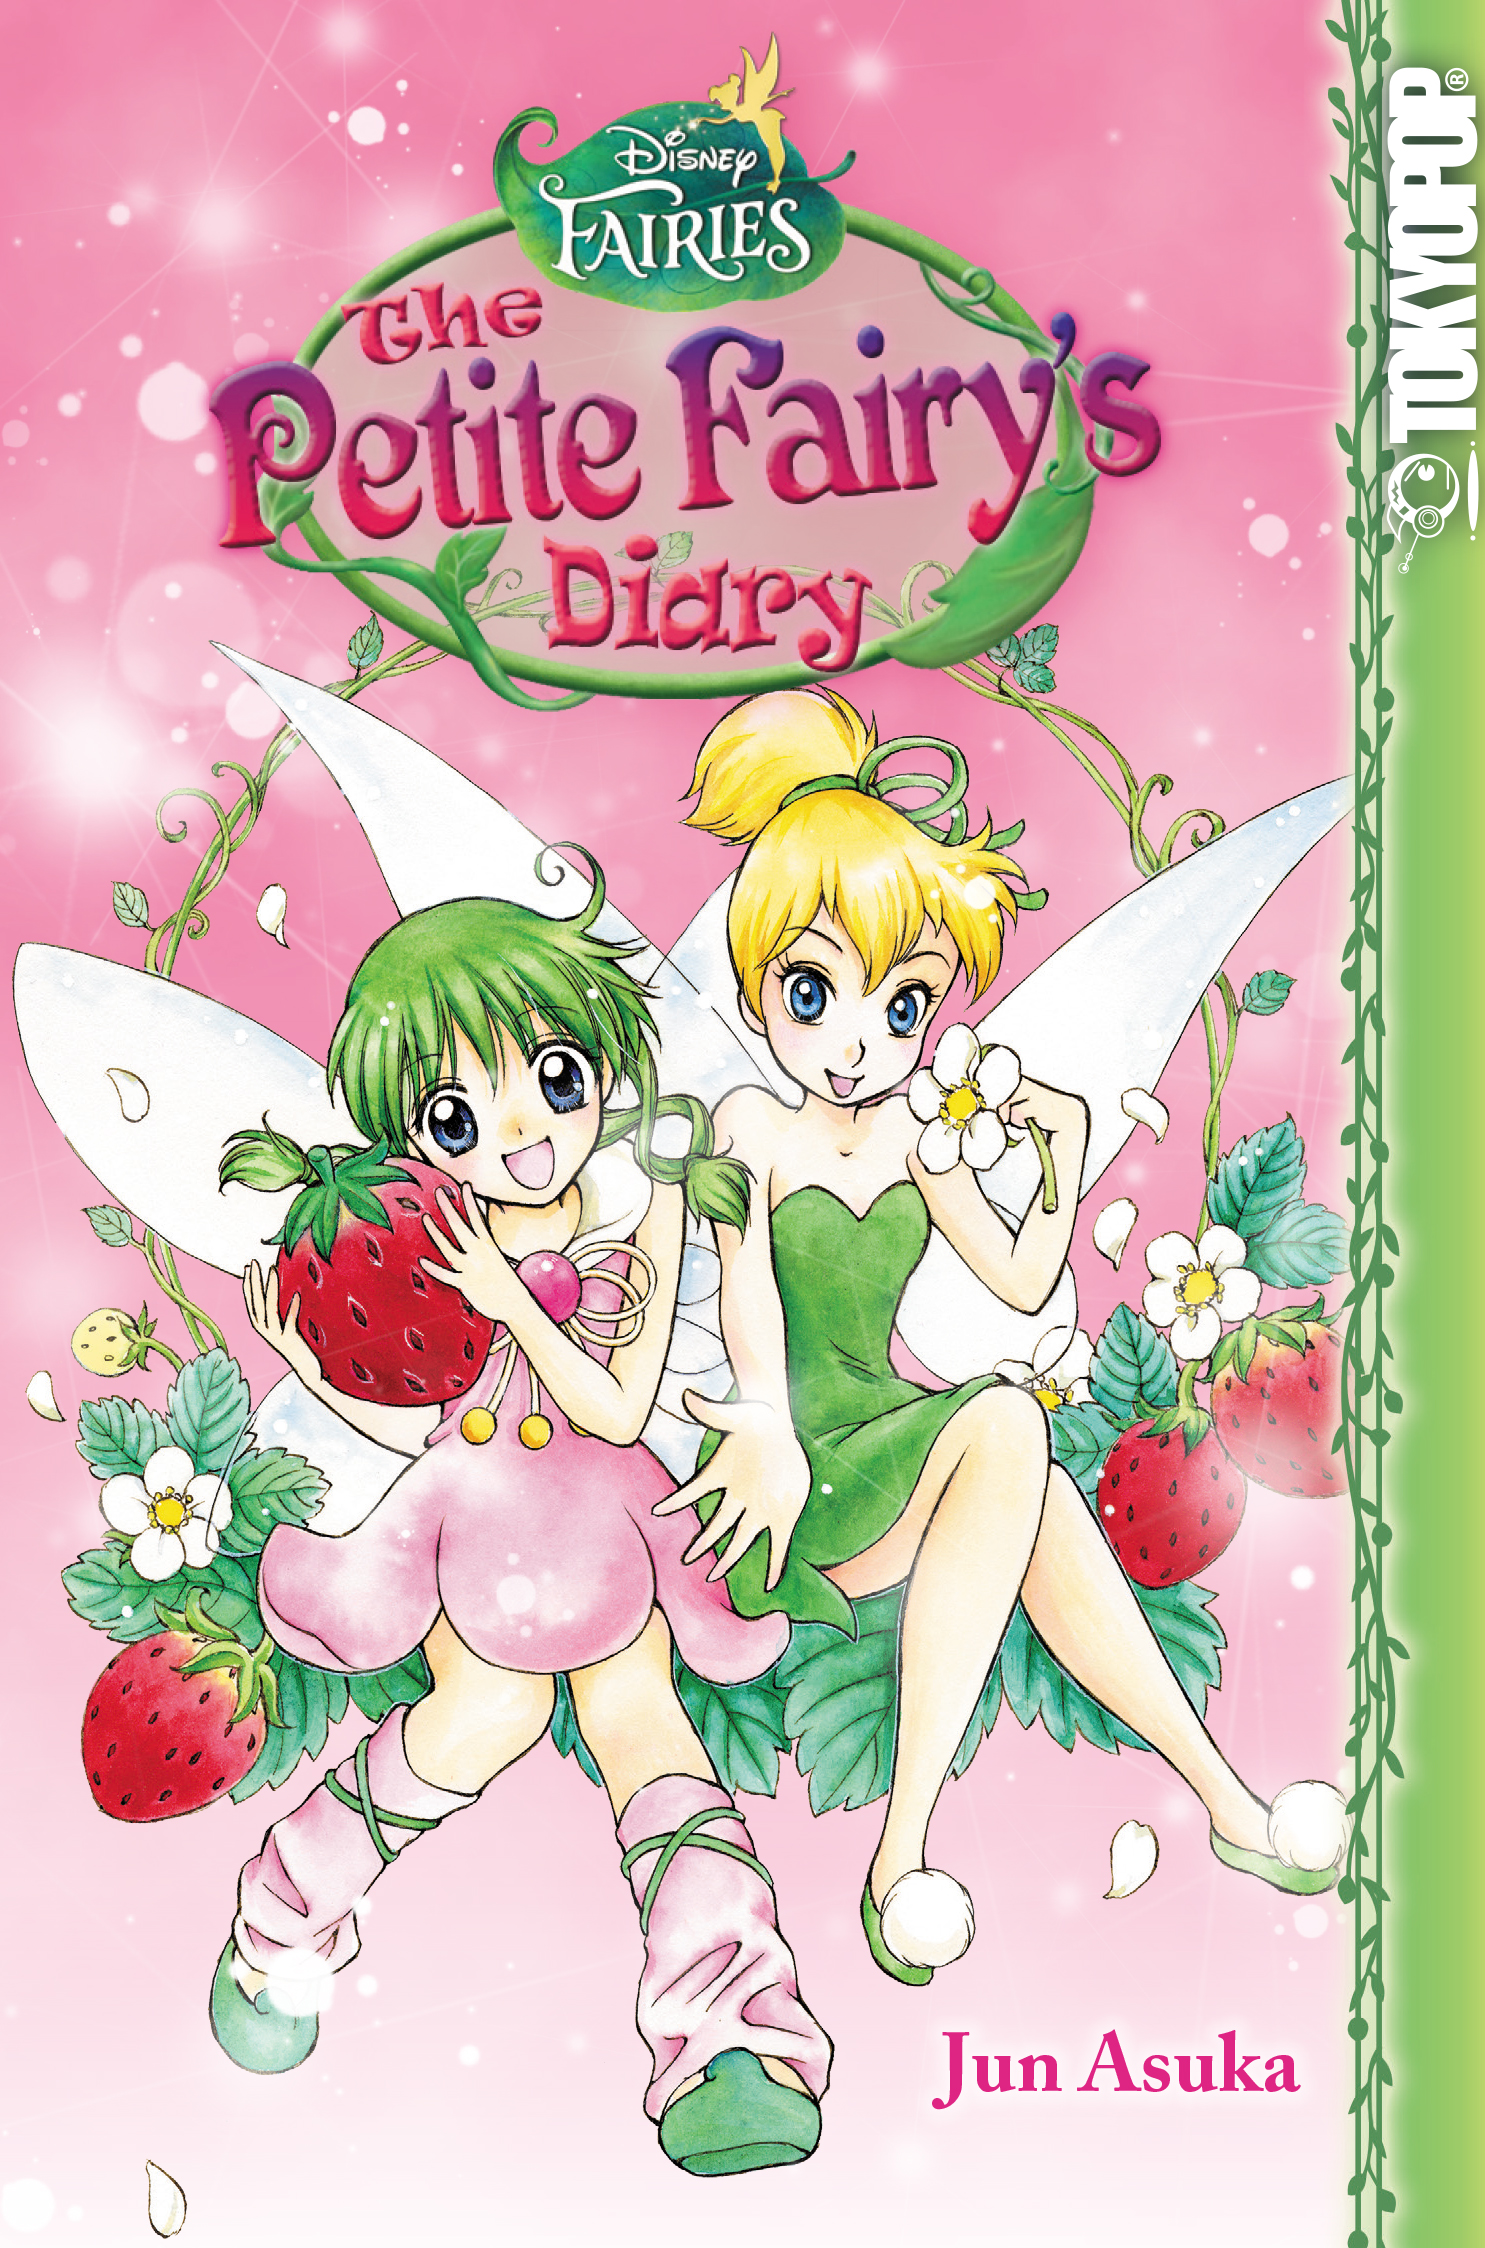 Fairies: The Petite Fairy's Diary